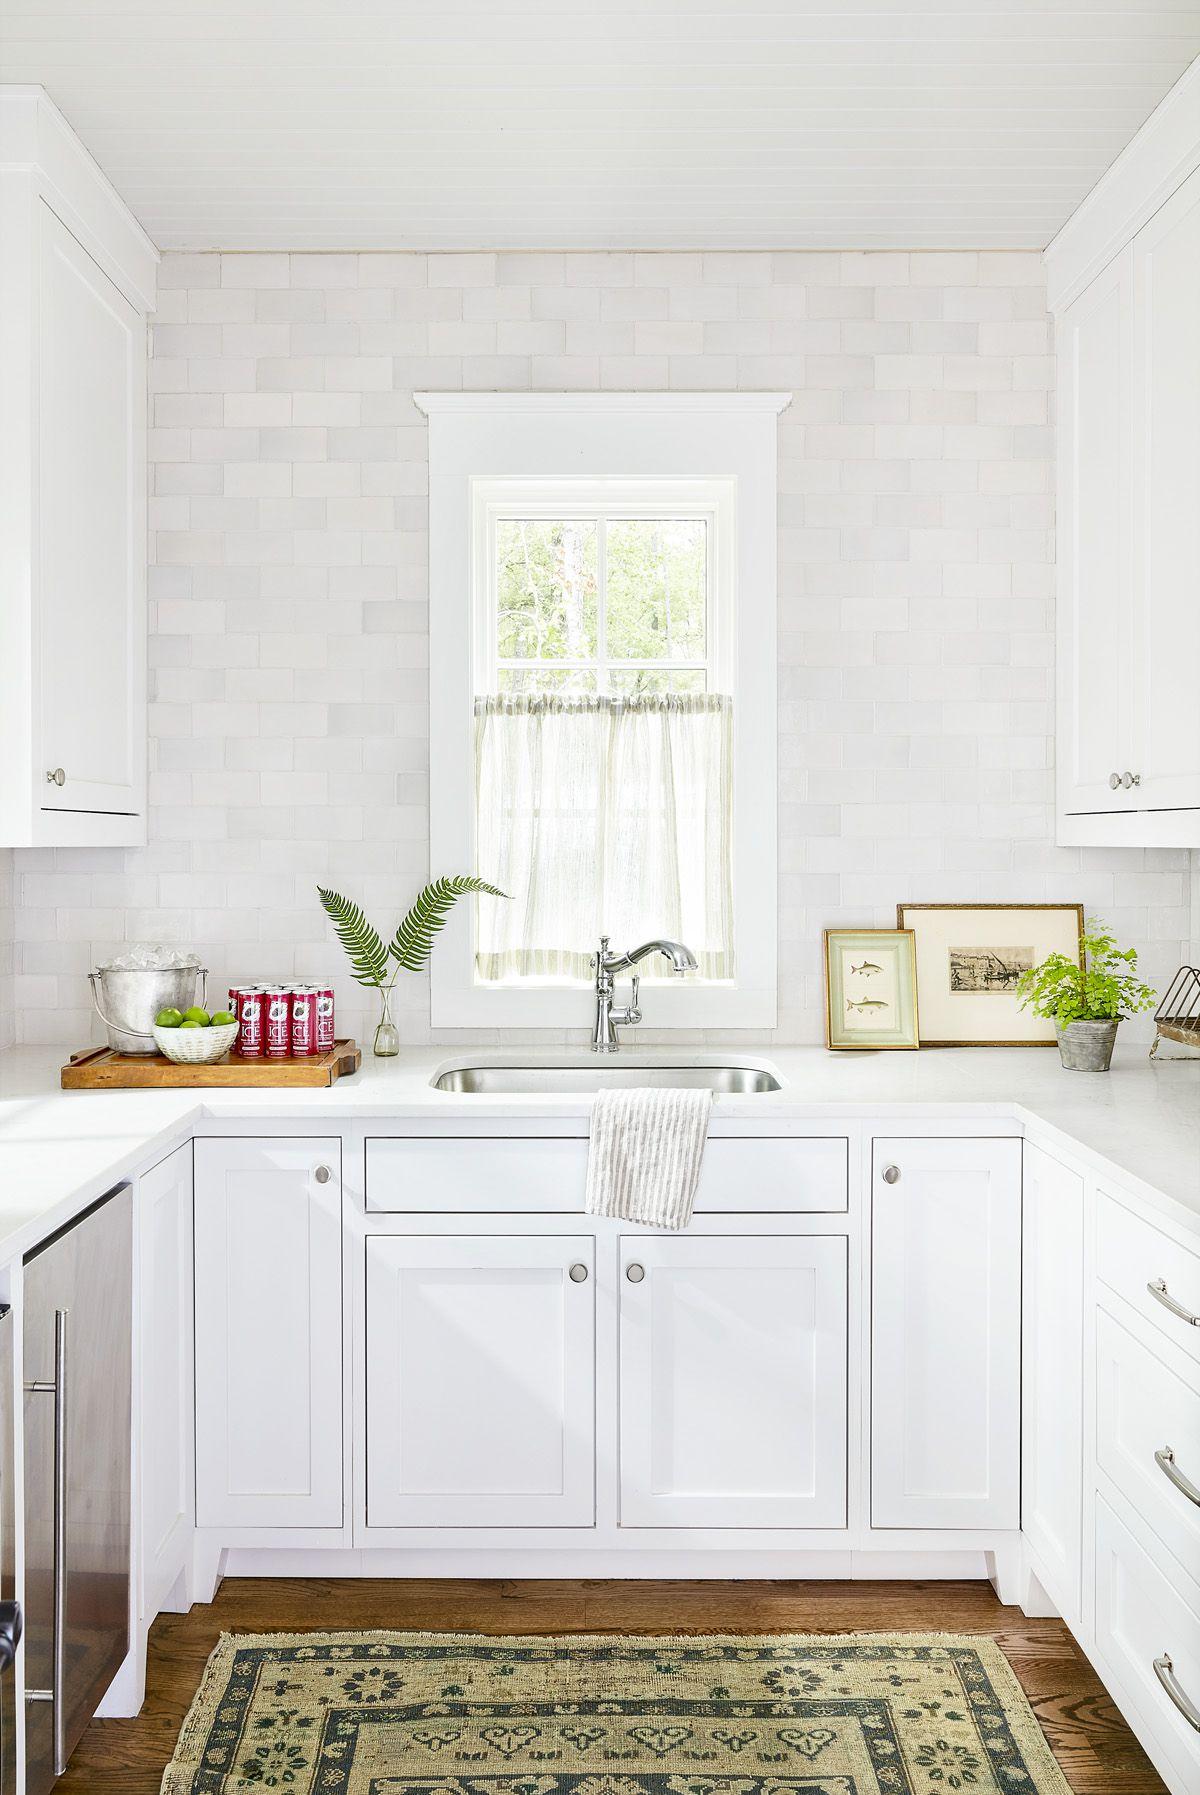 White kitchens 24 best white kitchens - pictures of white kitchen design ideas MGIWGDQ